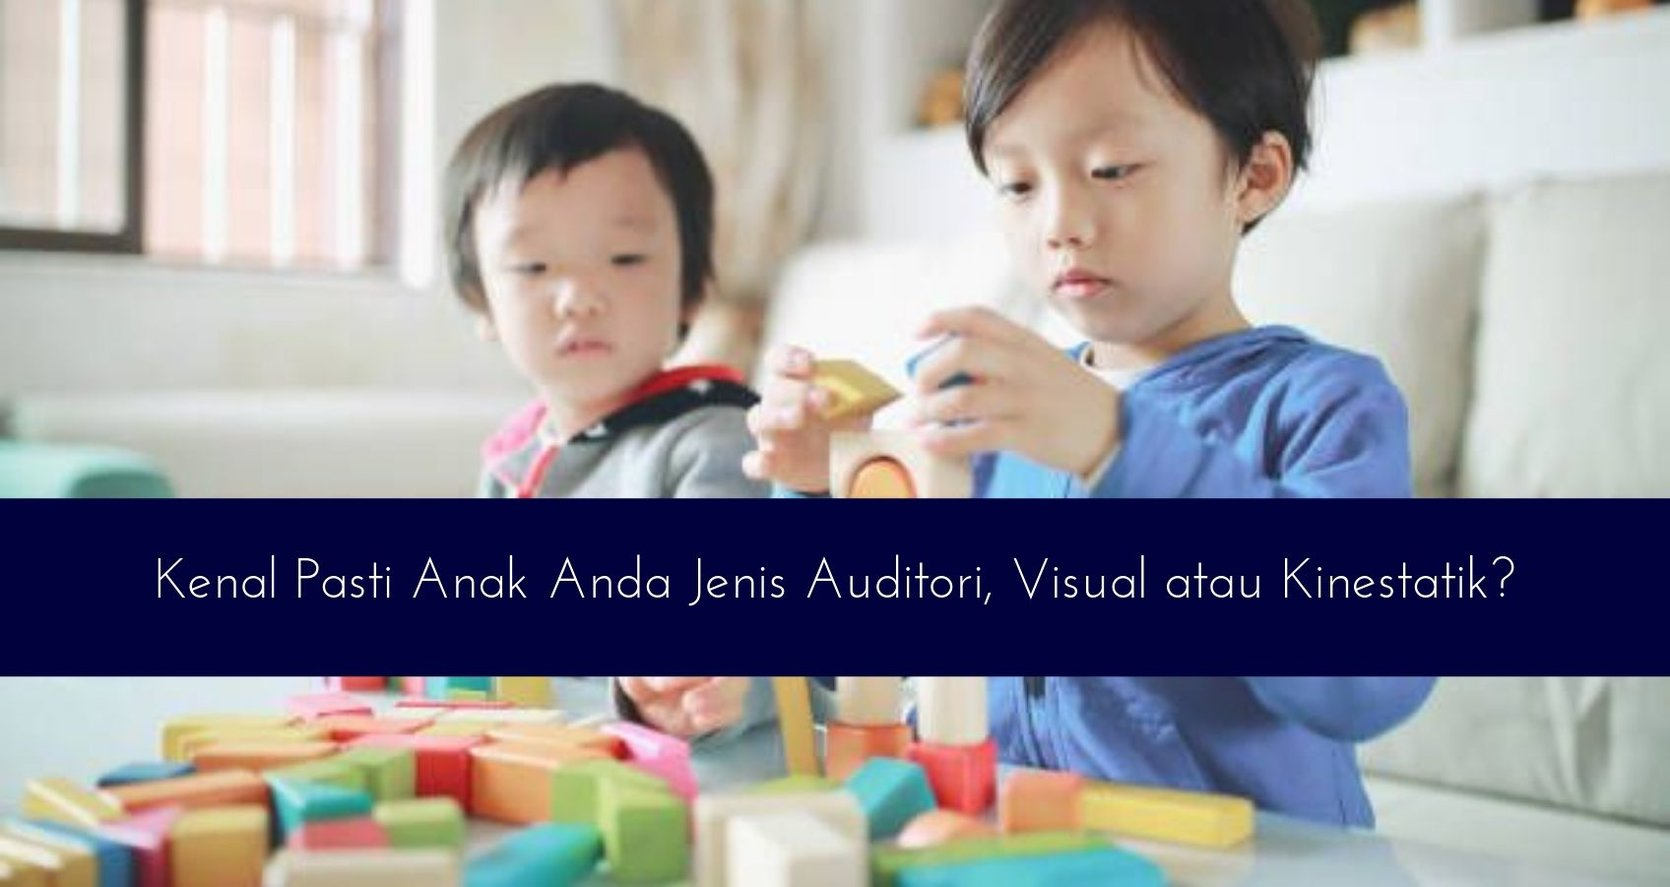 Kenal Pasti Anak Anda Jenis Auditori, Visual atau Kinestatik?